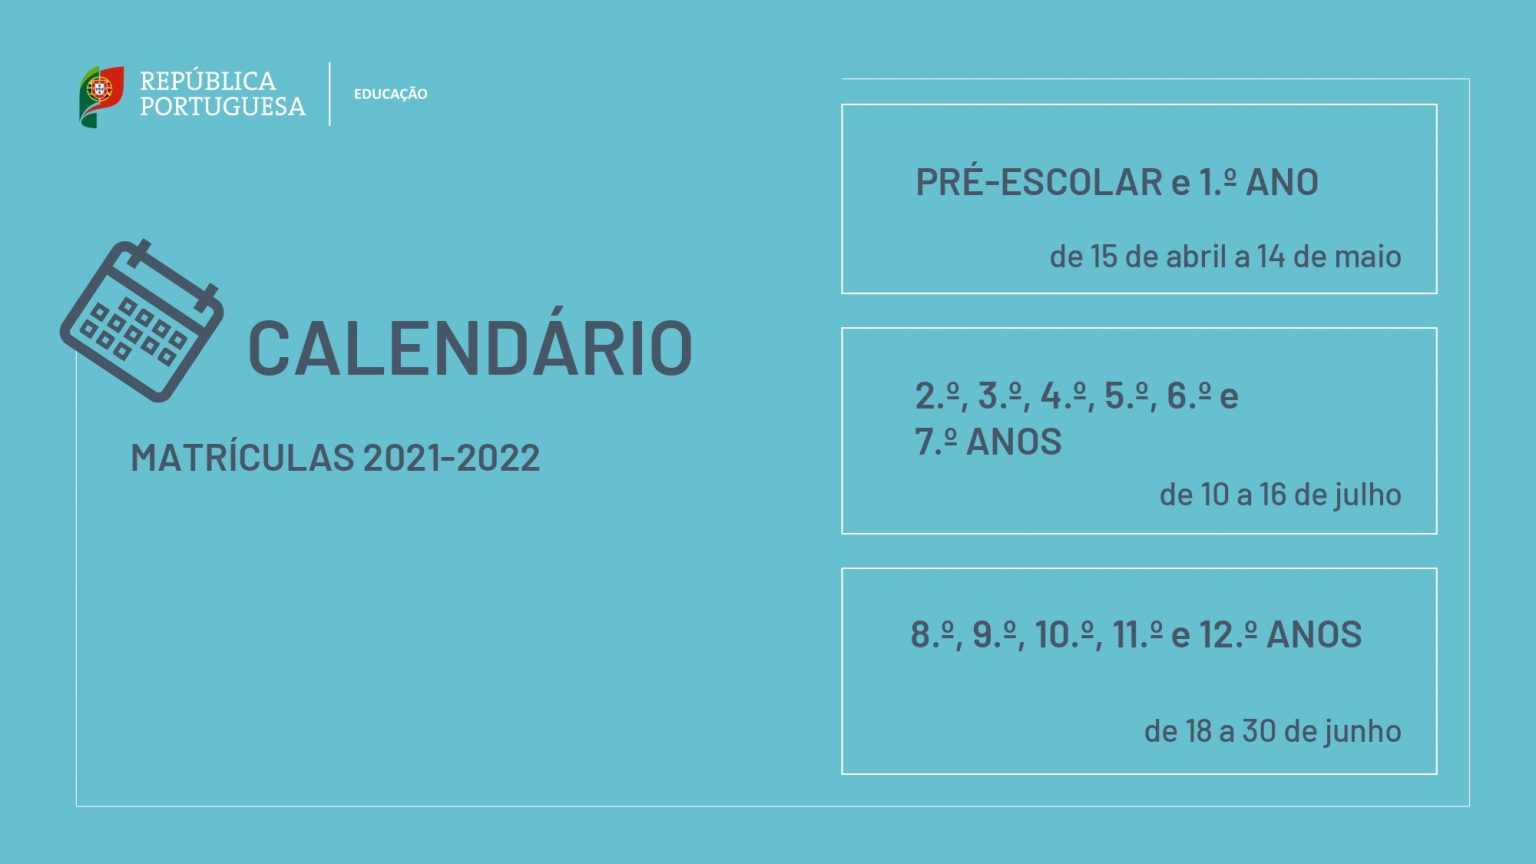 PPT_MatriculasParaEE_Regras_AnoLetivo_2021_2022_page-0005